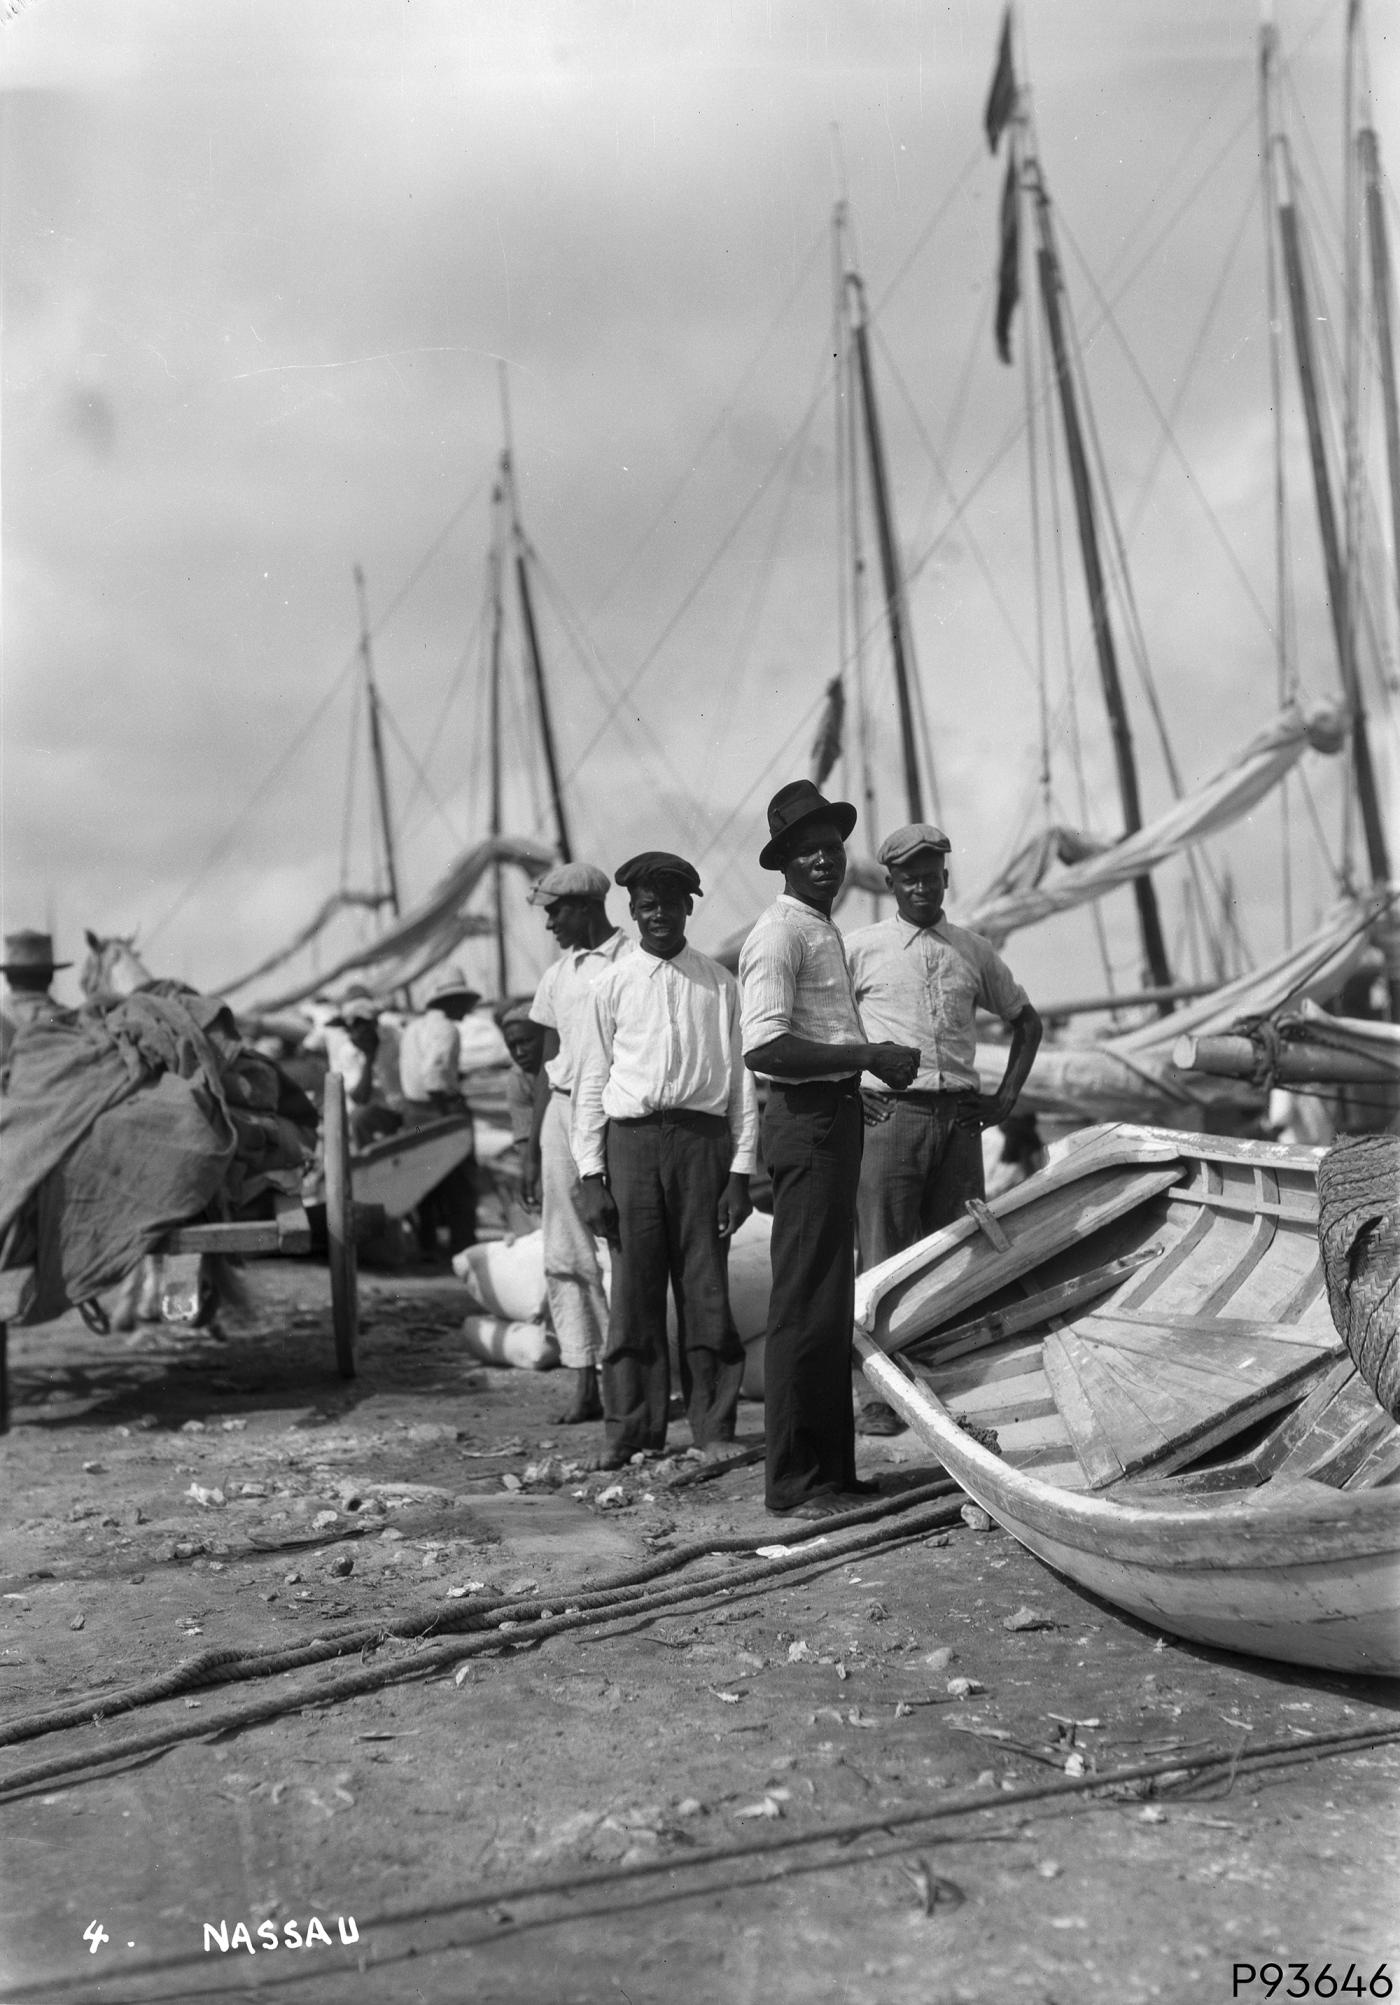 An image showing 'Nassau, Bahamas'